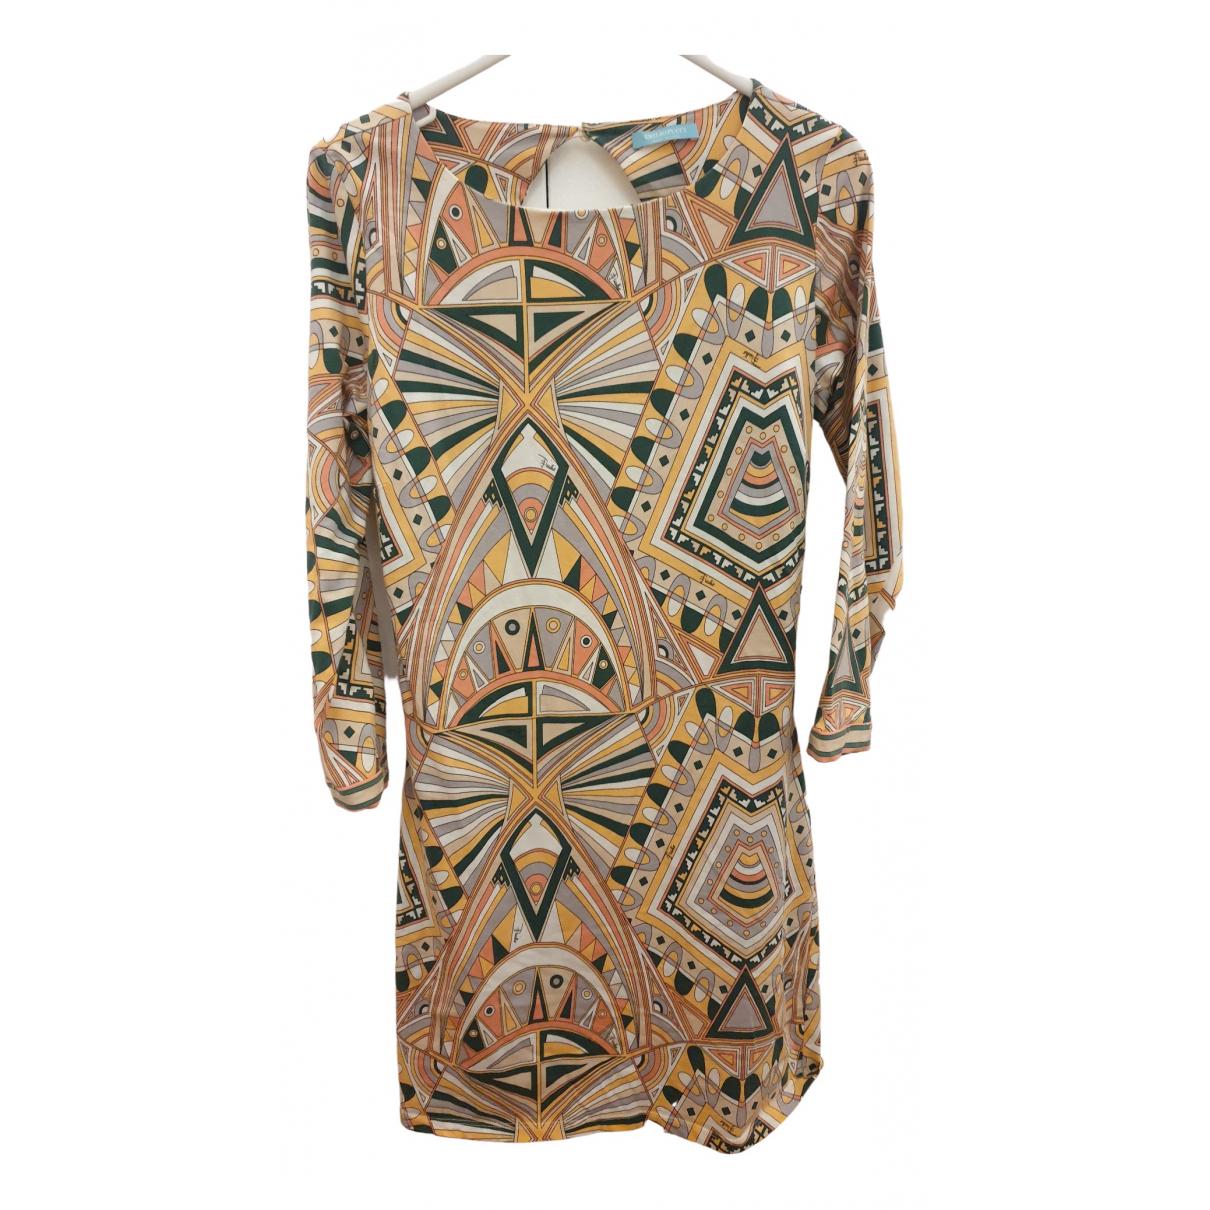 Emilio Pucci \N Kleid in  Bunt Baumwolle - Elasthan